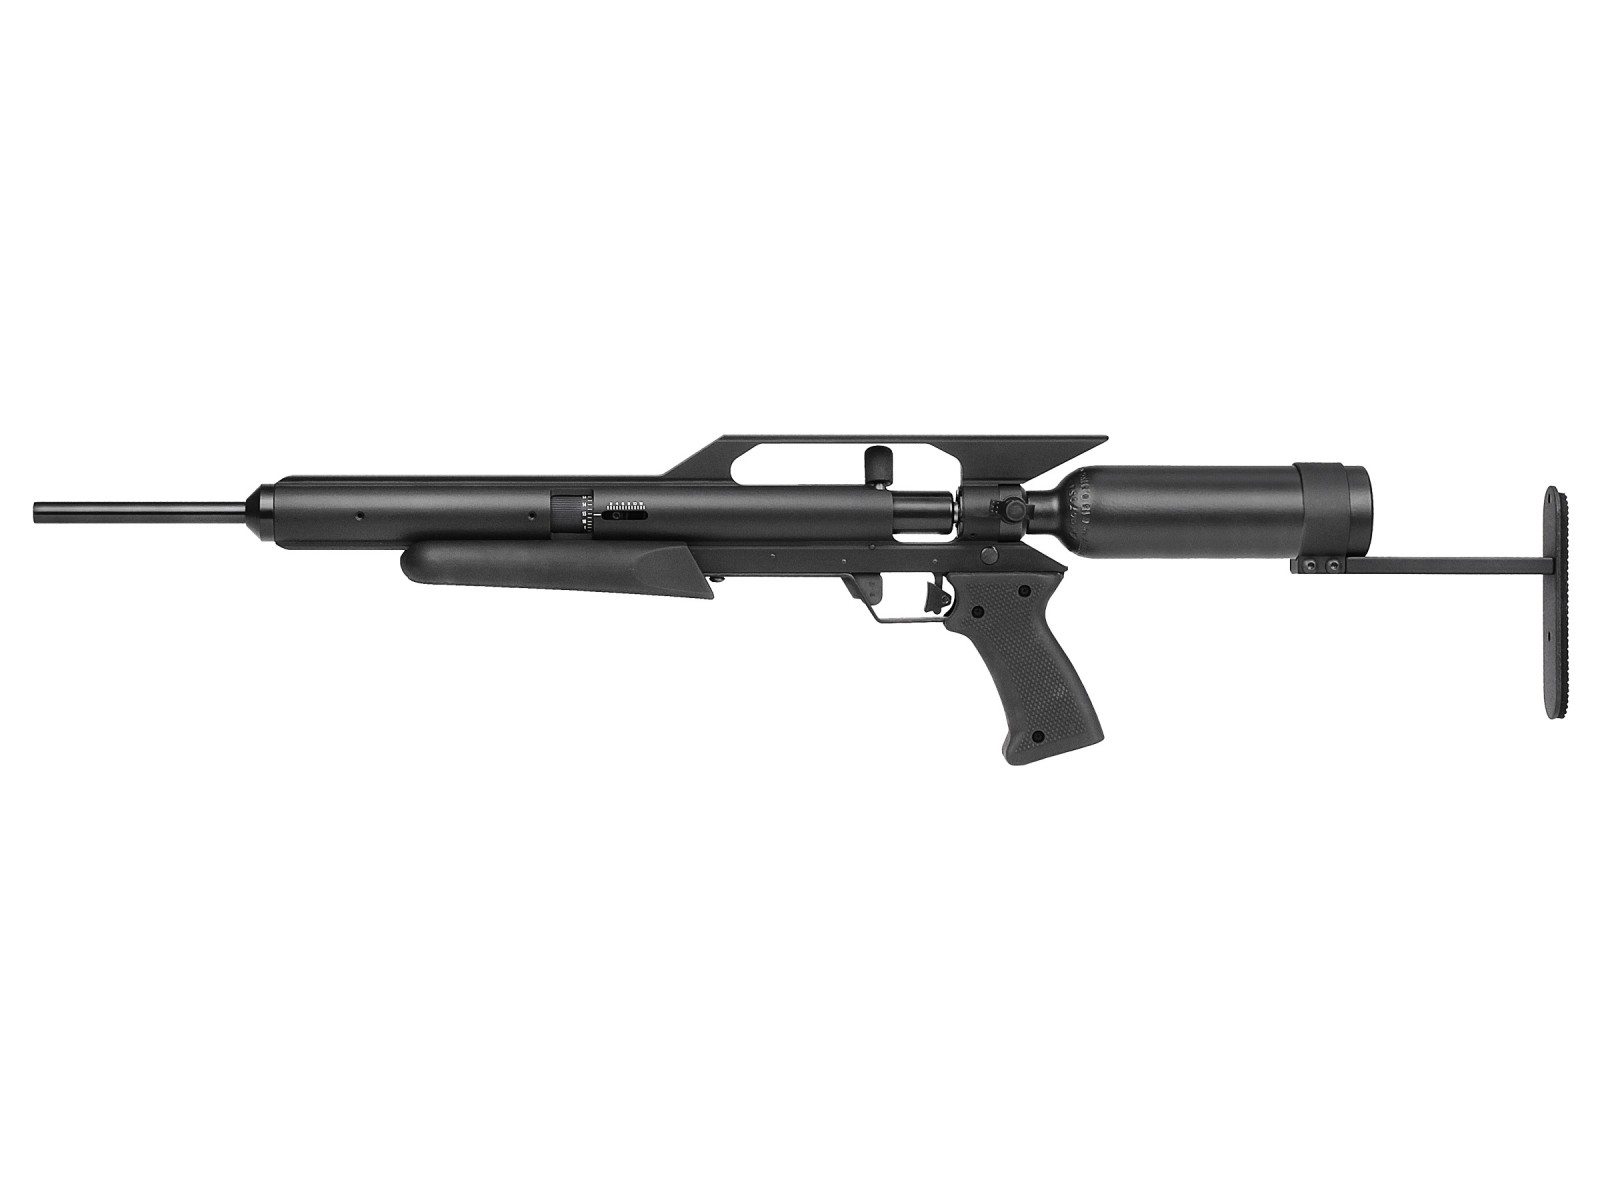 AirForce EscapeUL Air Rifle, Spin-Loc Tank 0.22